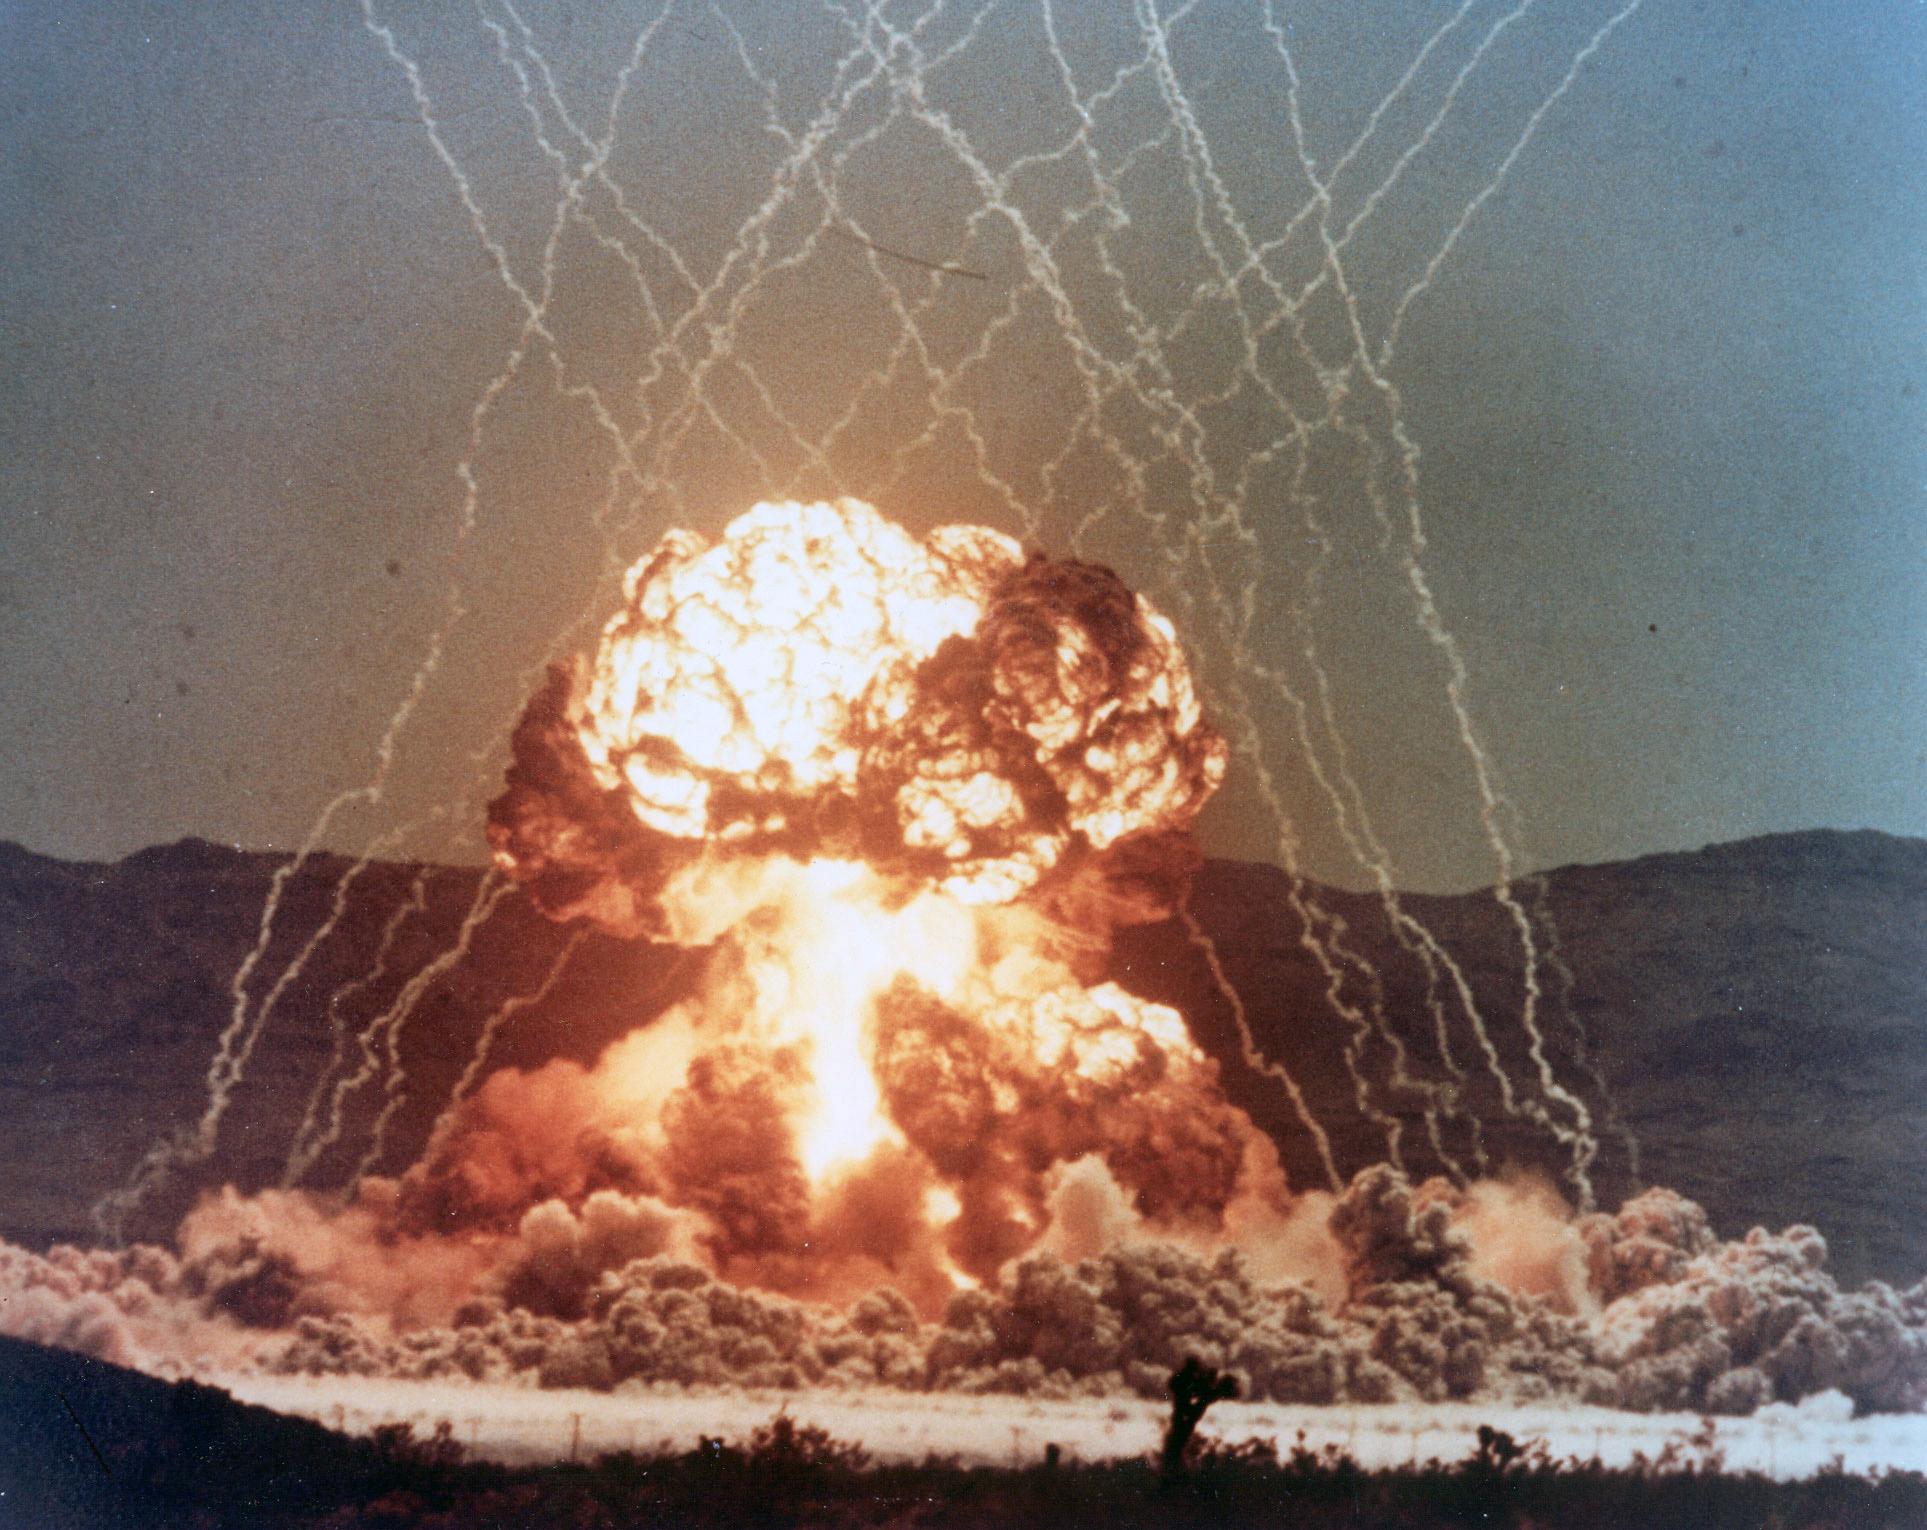 LLNL 把一小部份解密的核试爆视频放到了 YouTube 上